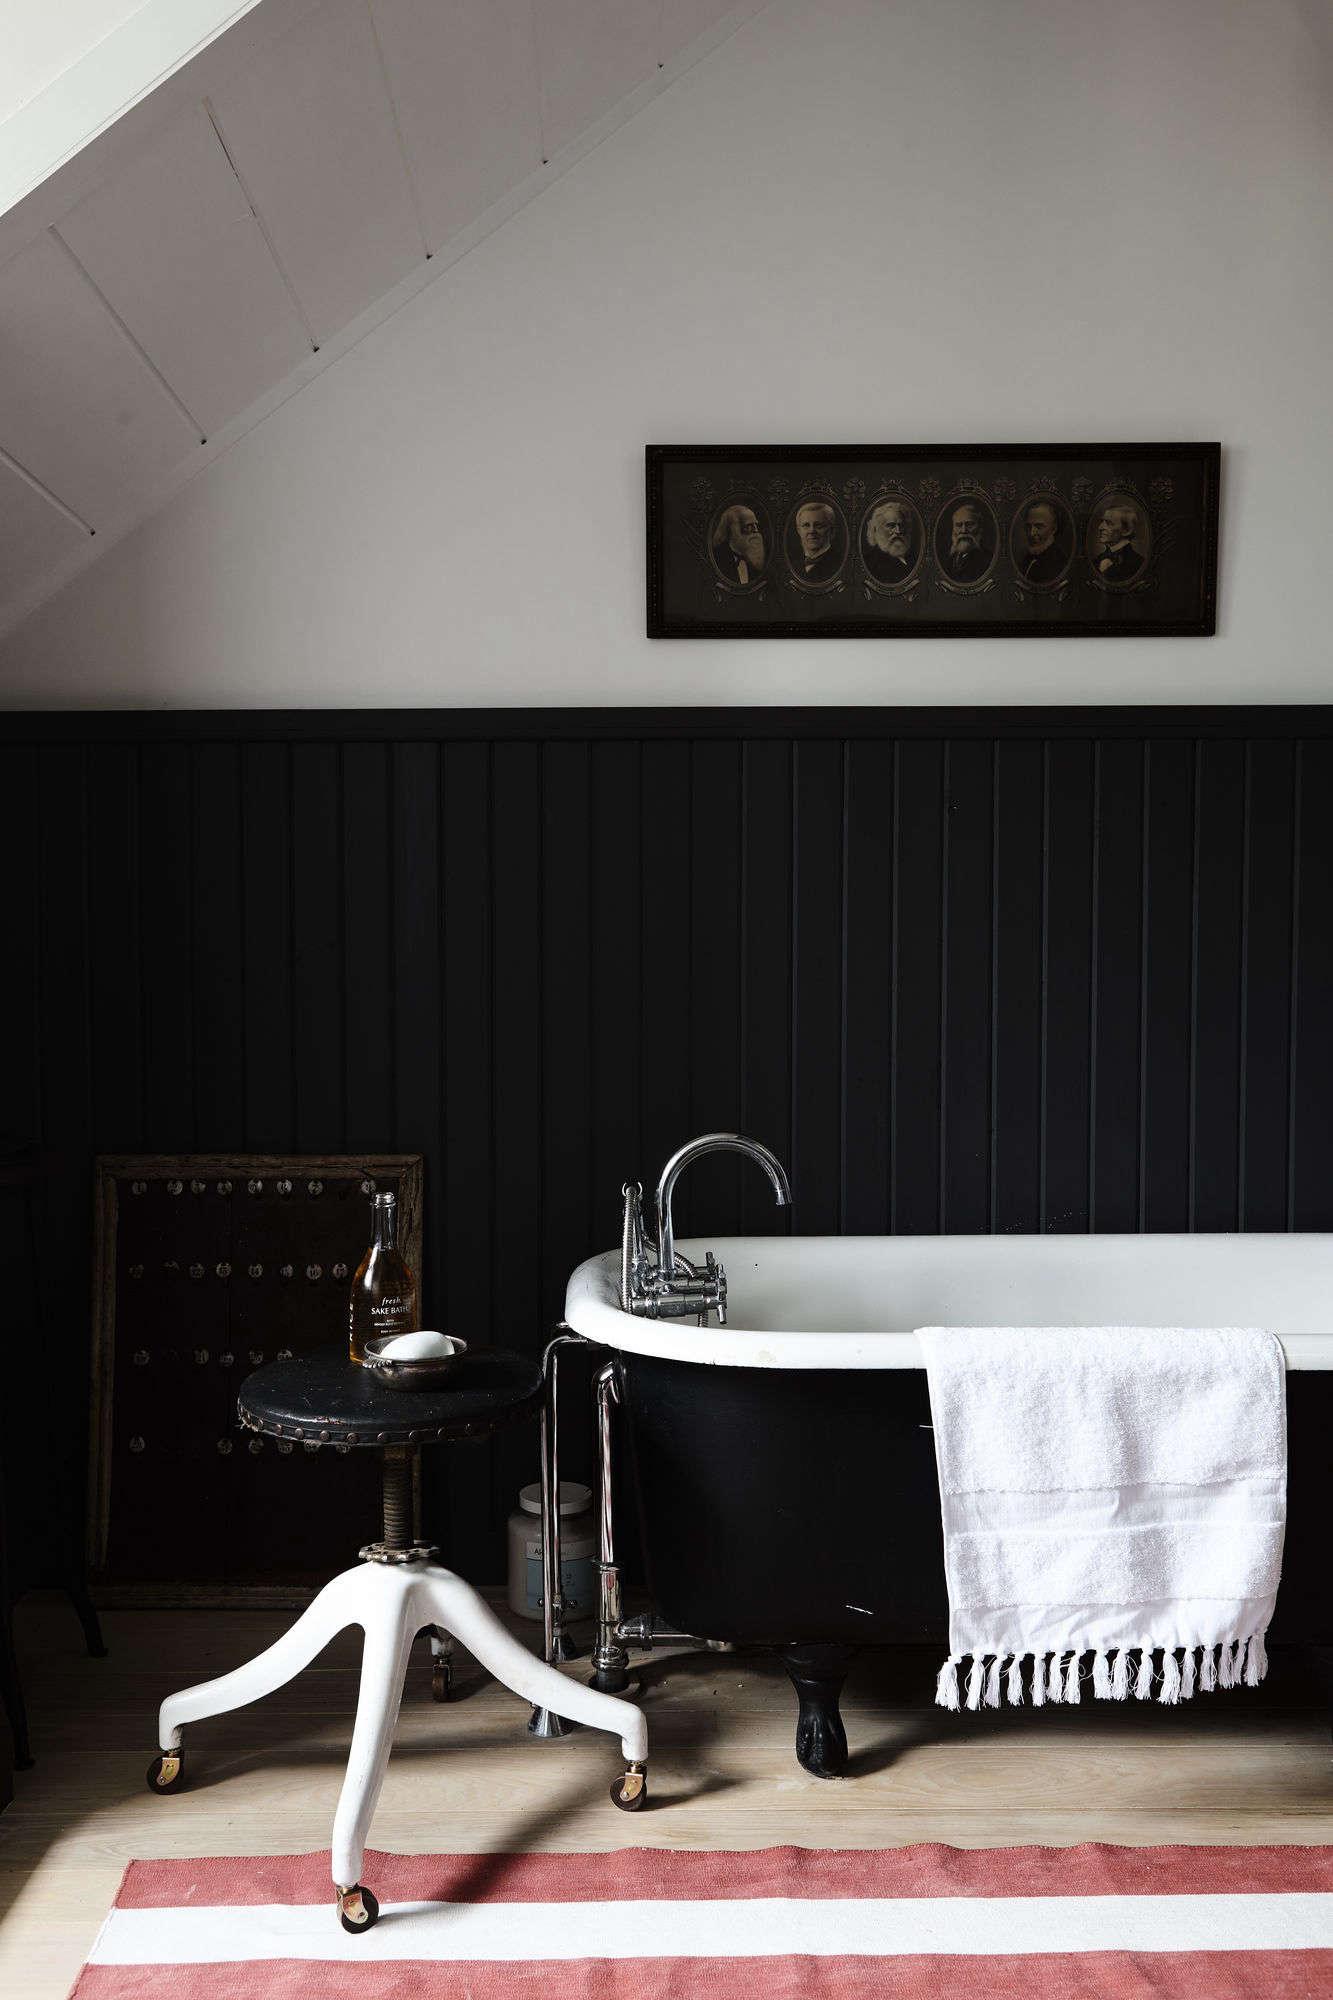 Red and white stripes add drama to a black bath. Photograph courtesy of Nicole Franzen.